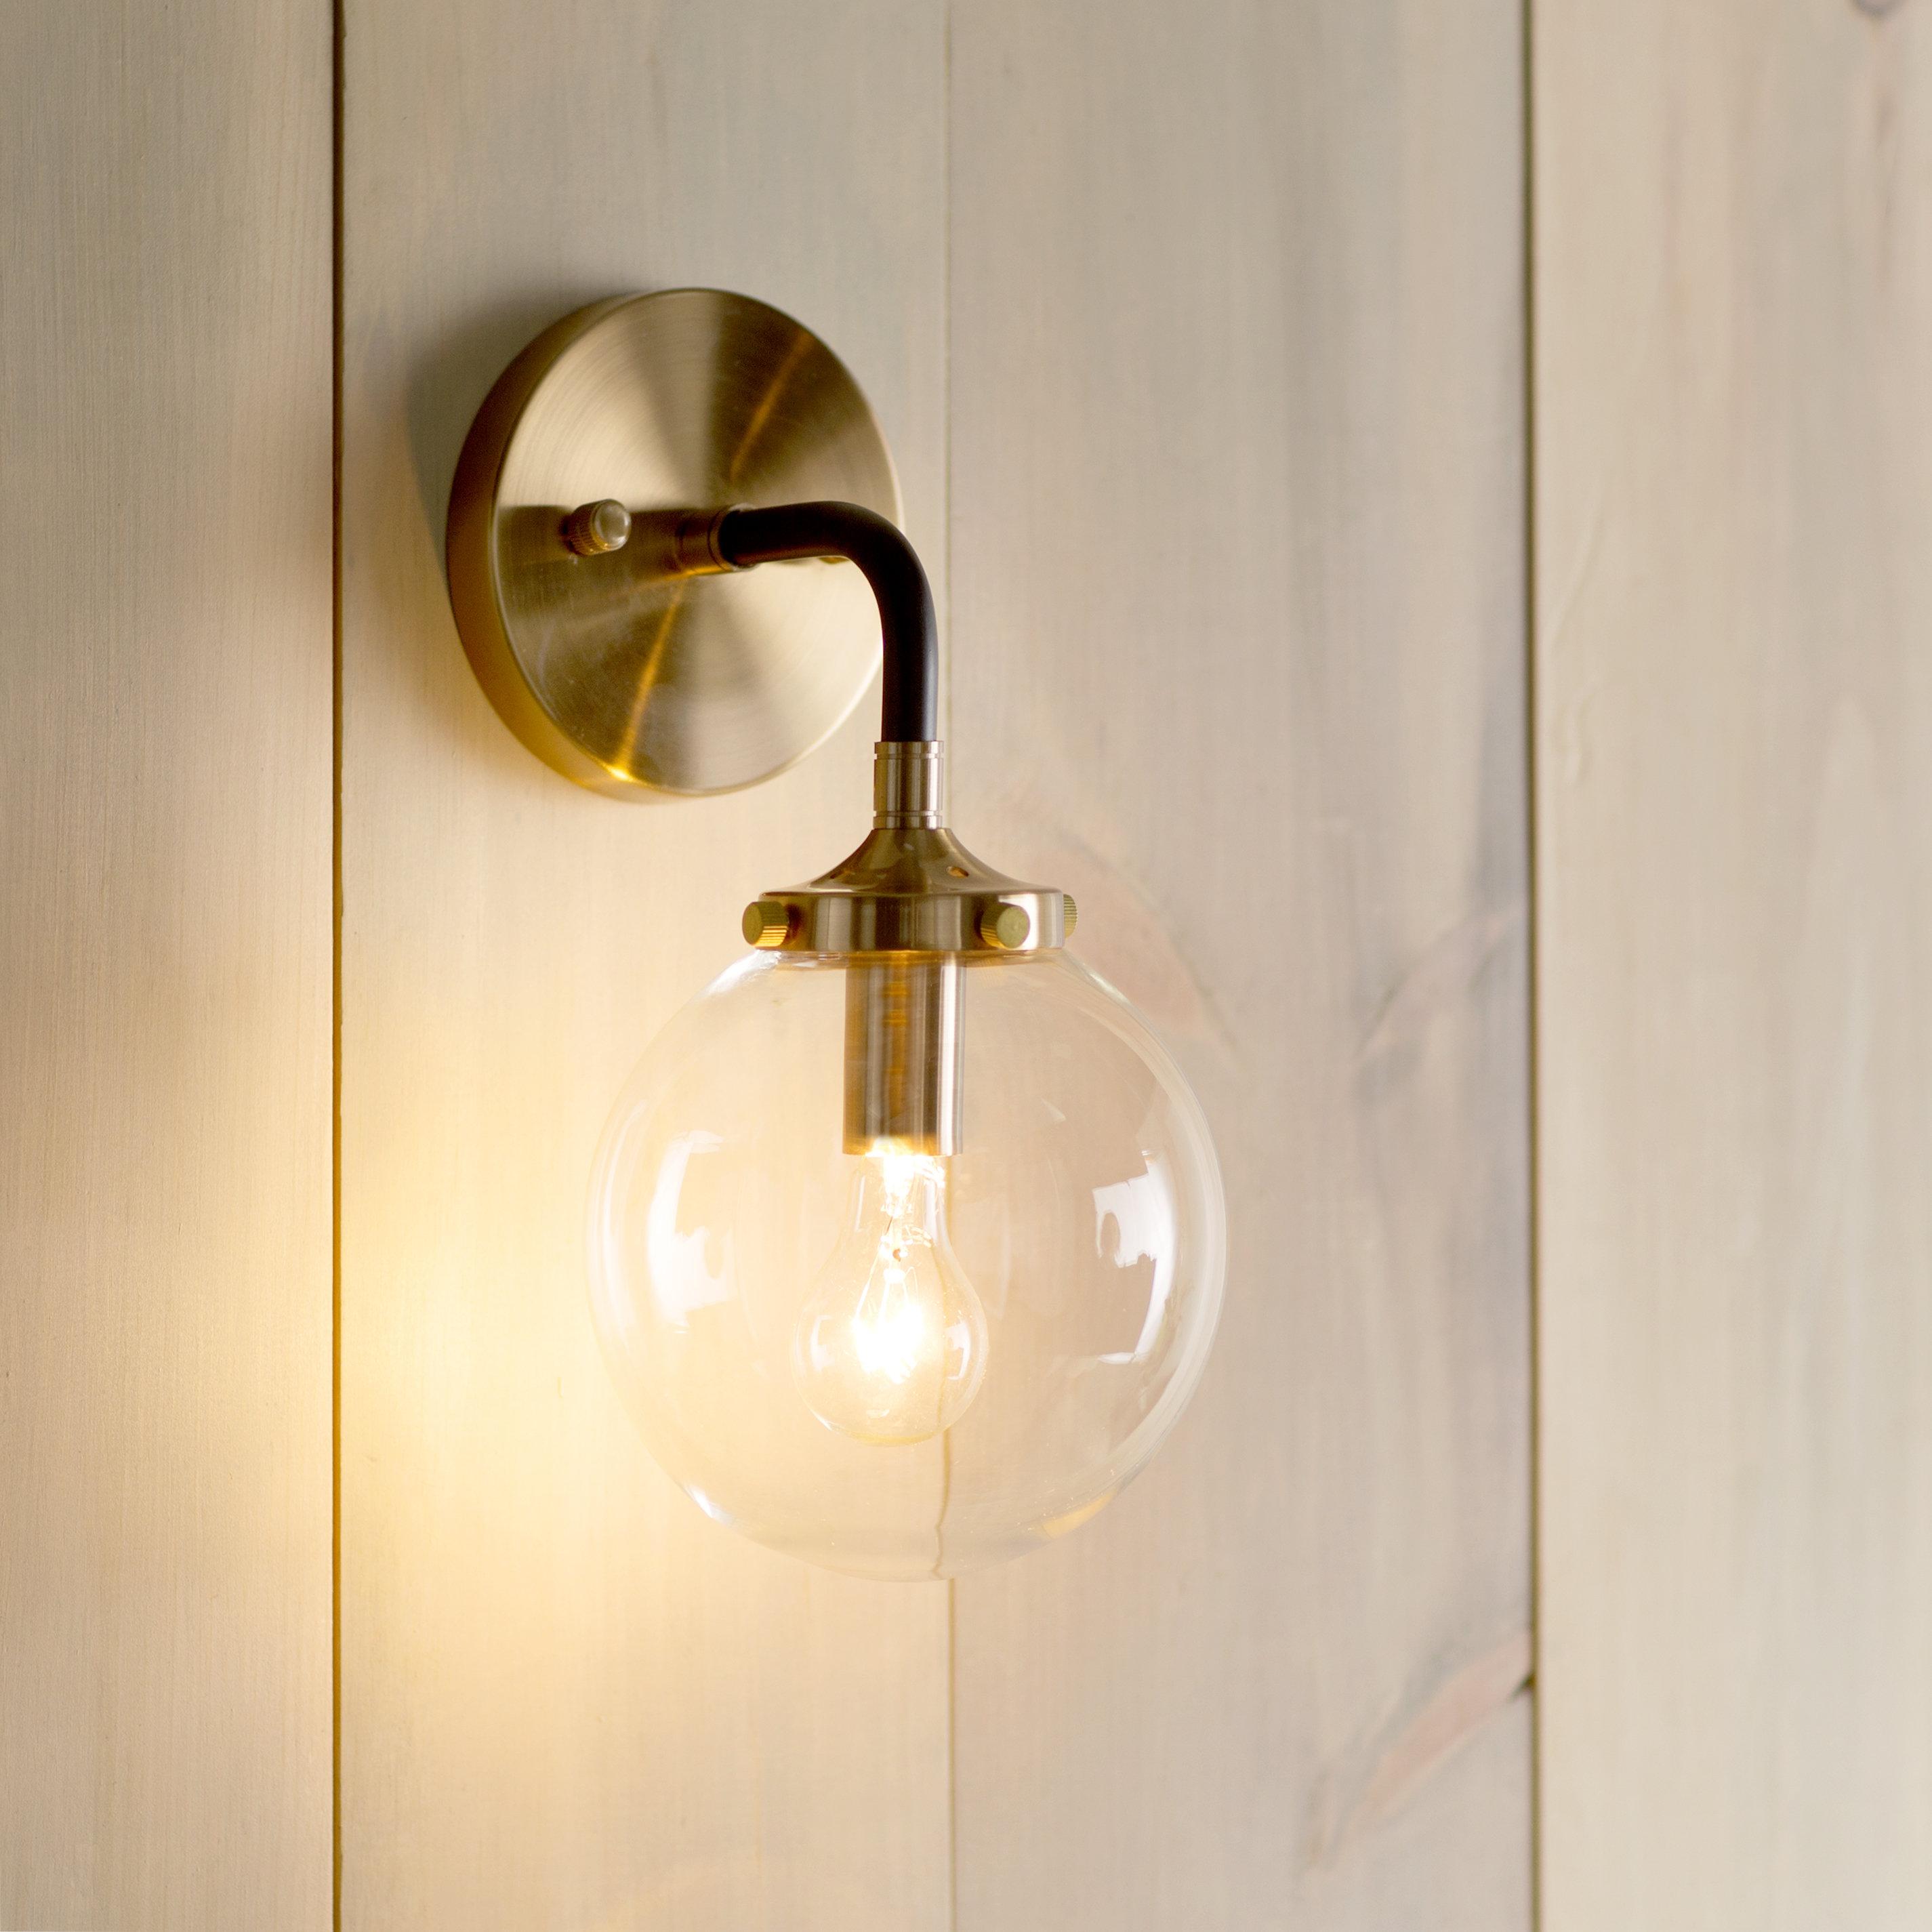 langley street christo 1-lamp wall light & reviews    Wayfair TXFKNMQ